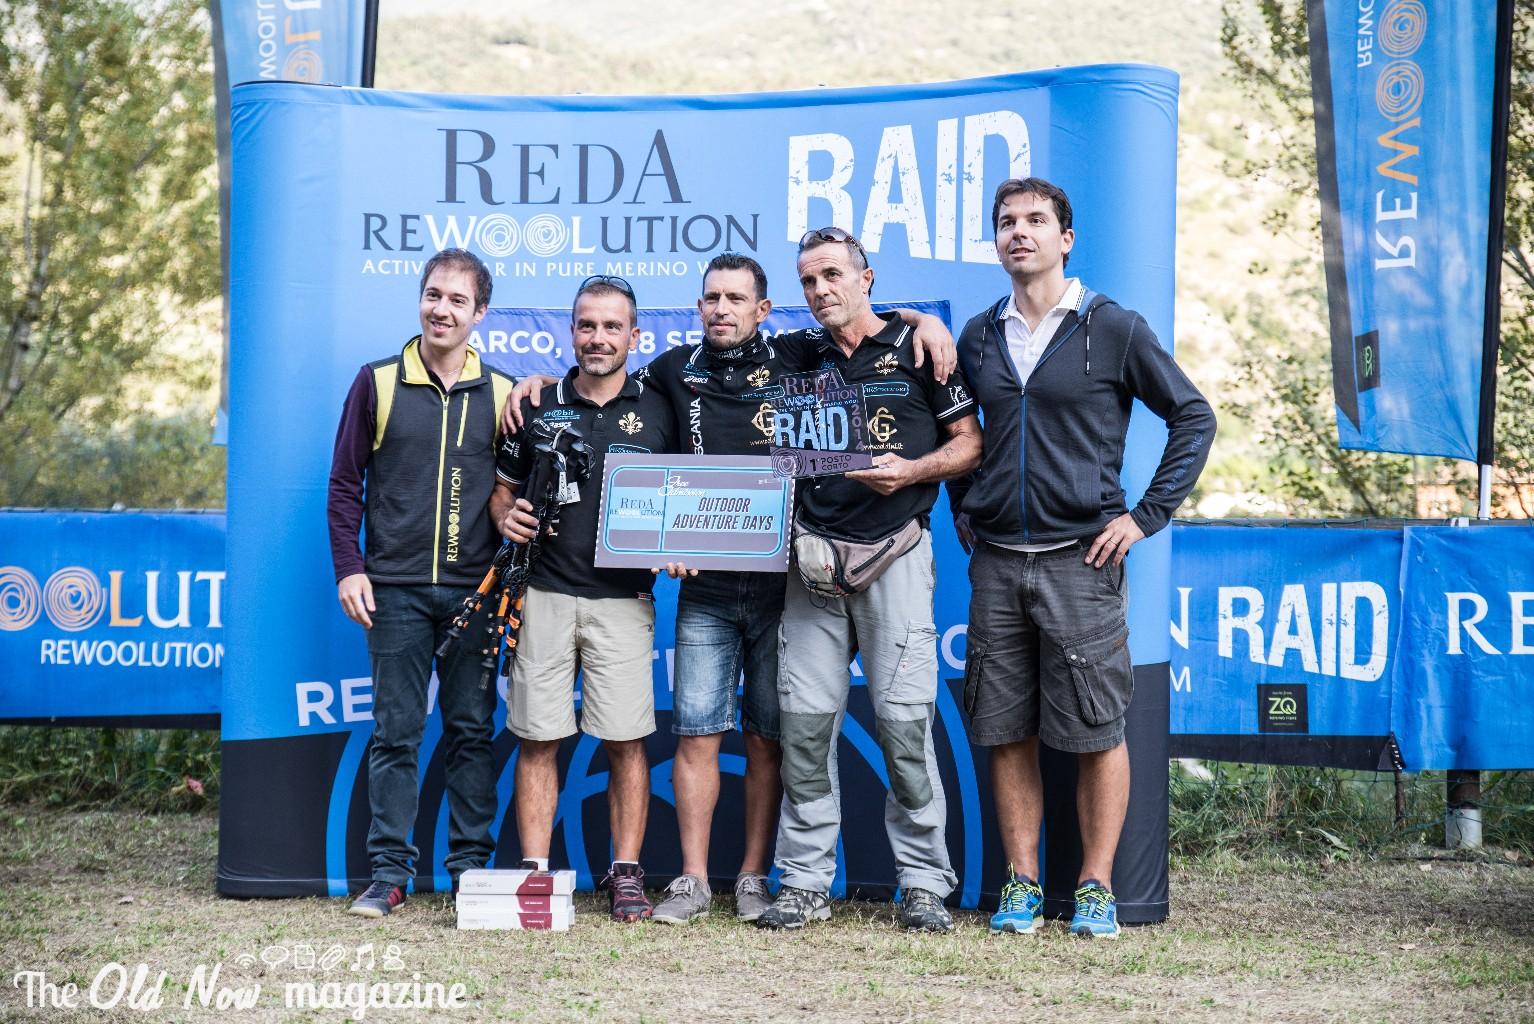 Reda Rewoolution Raid (1)